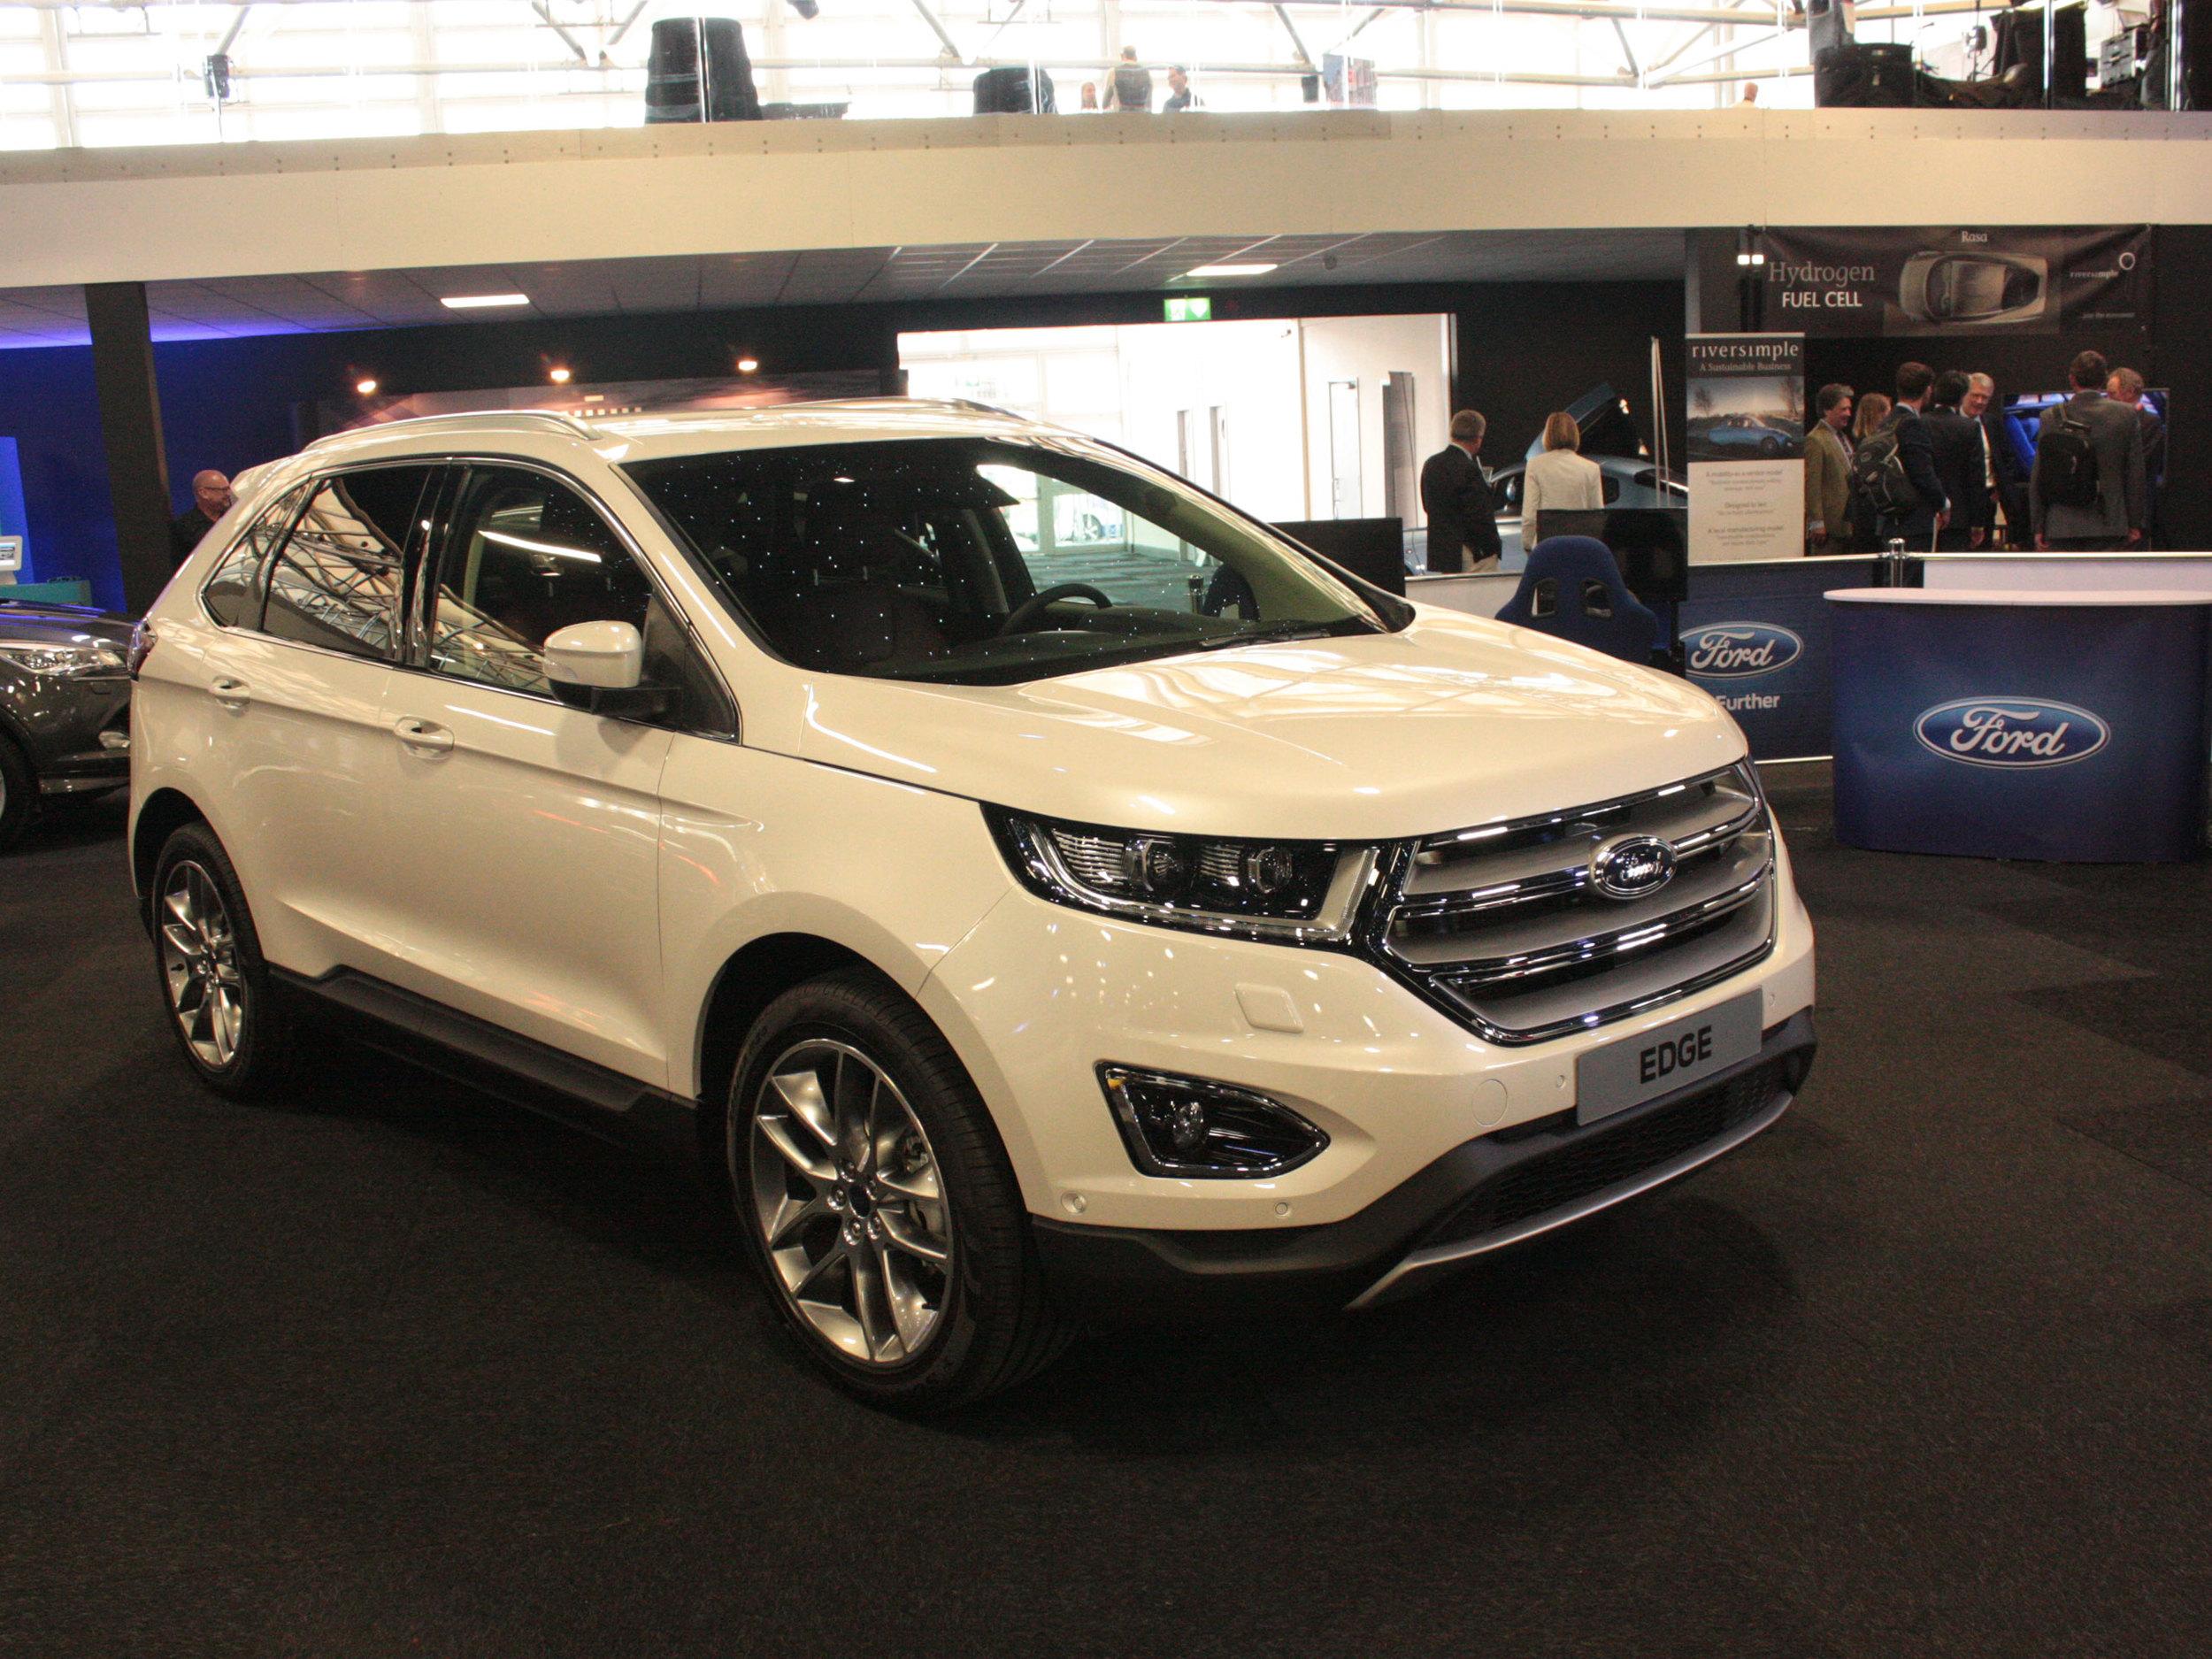 Ford-edge.jpg